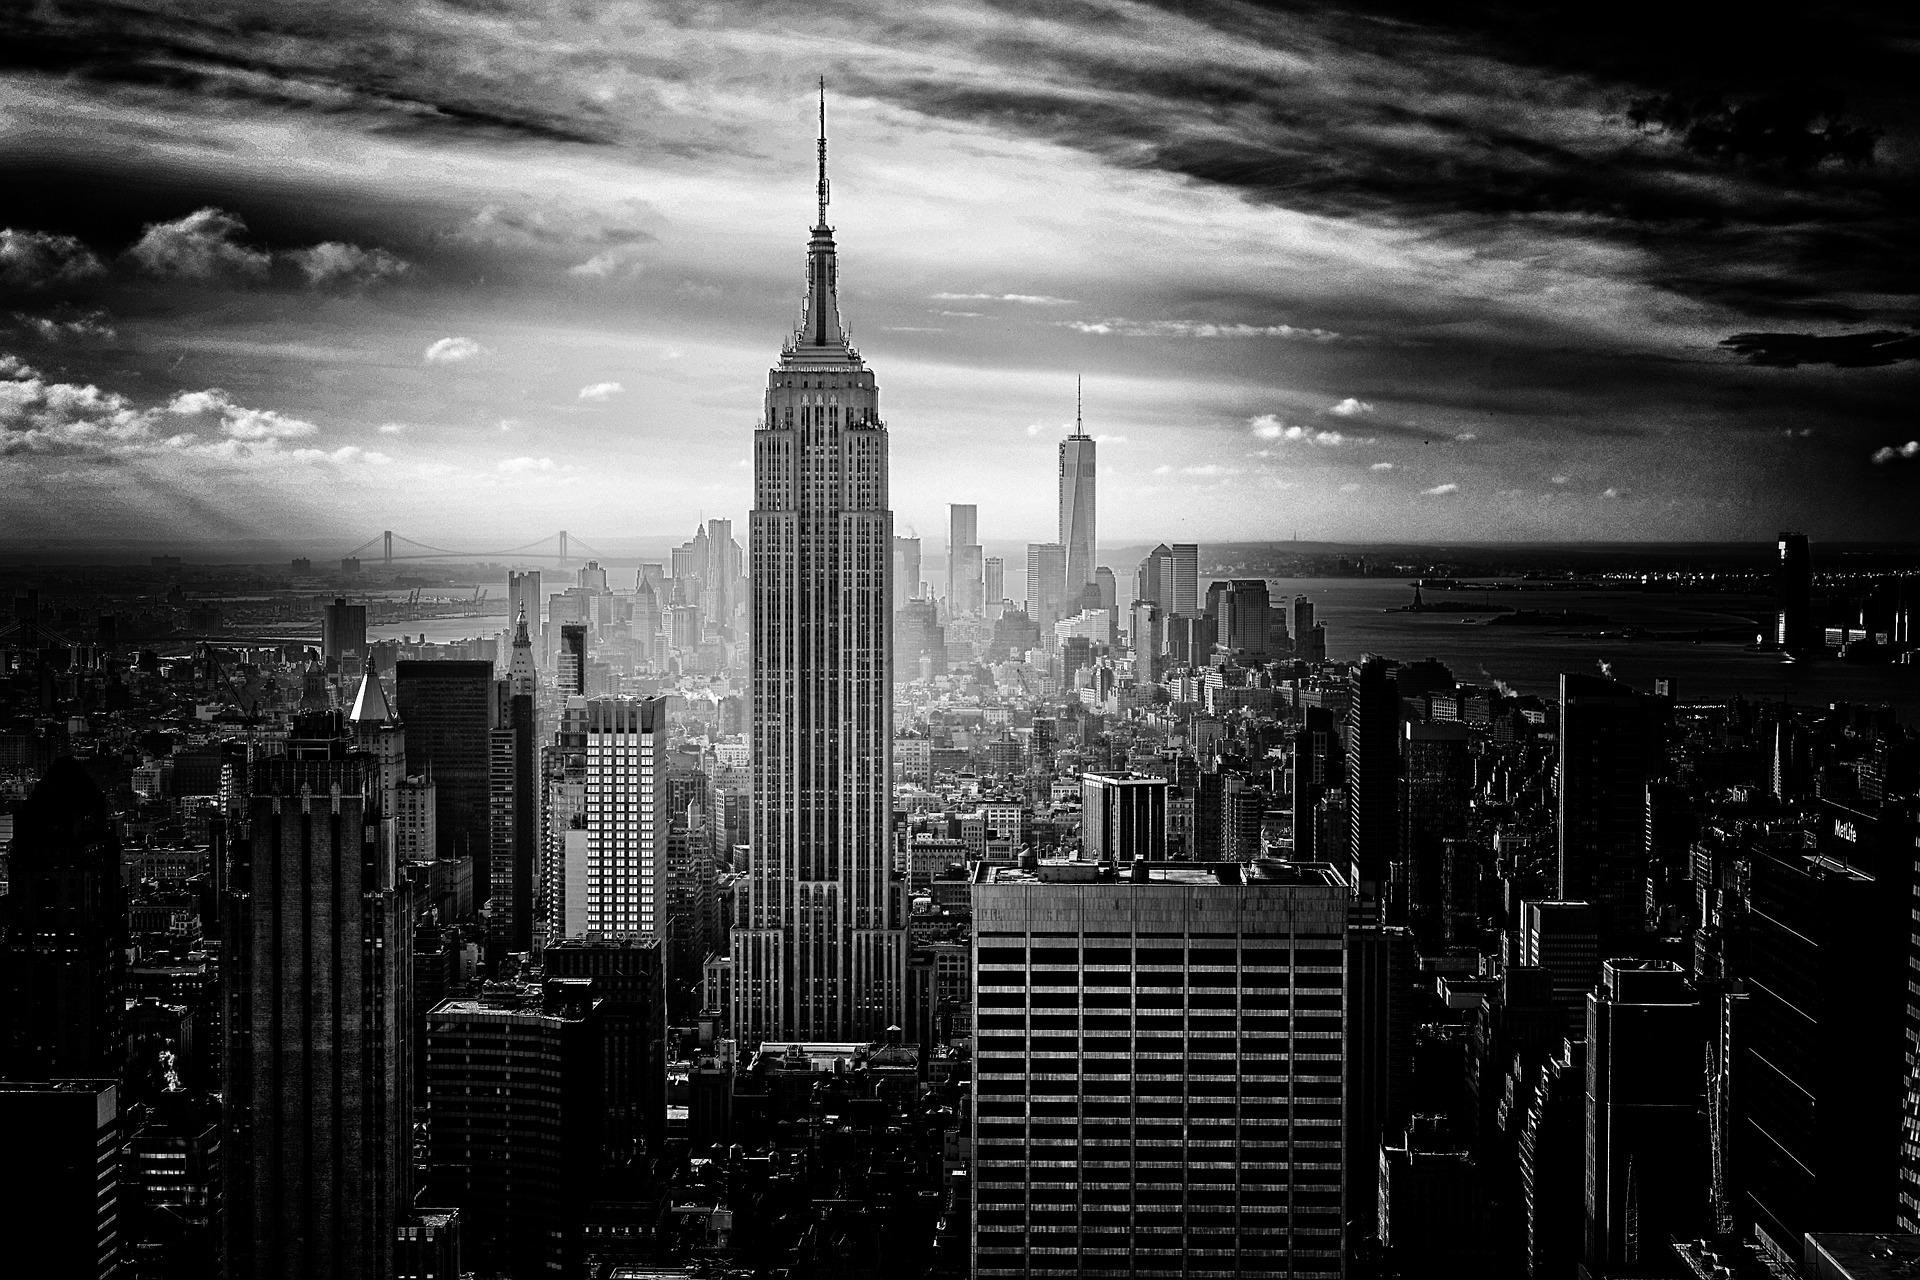 new-york-city-801867_1920.jpg